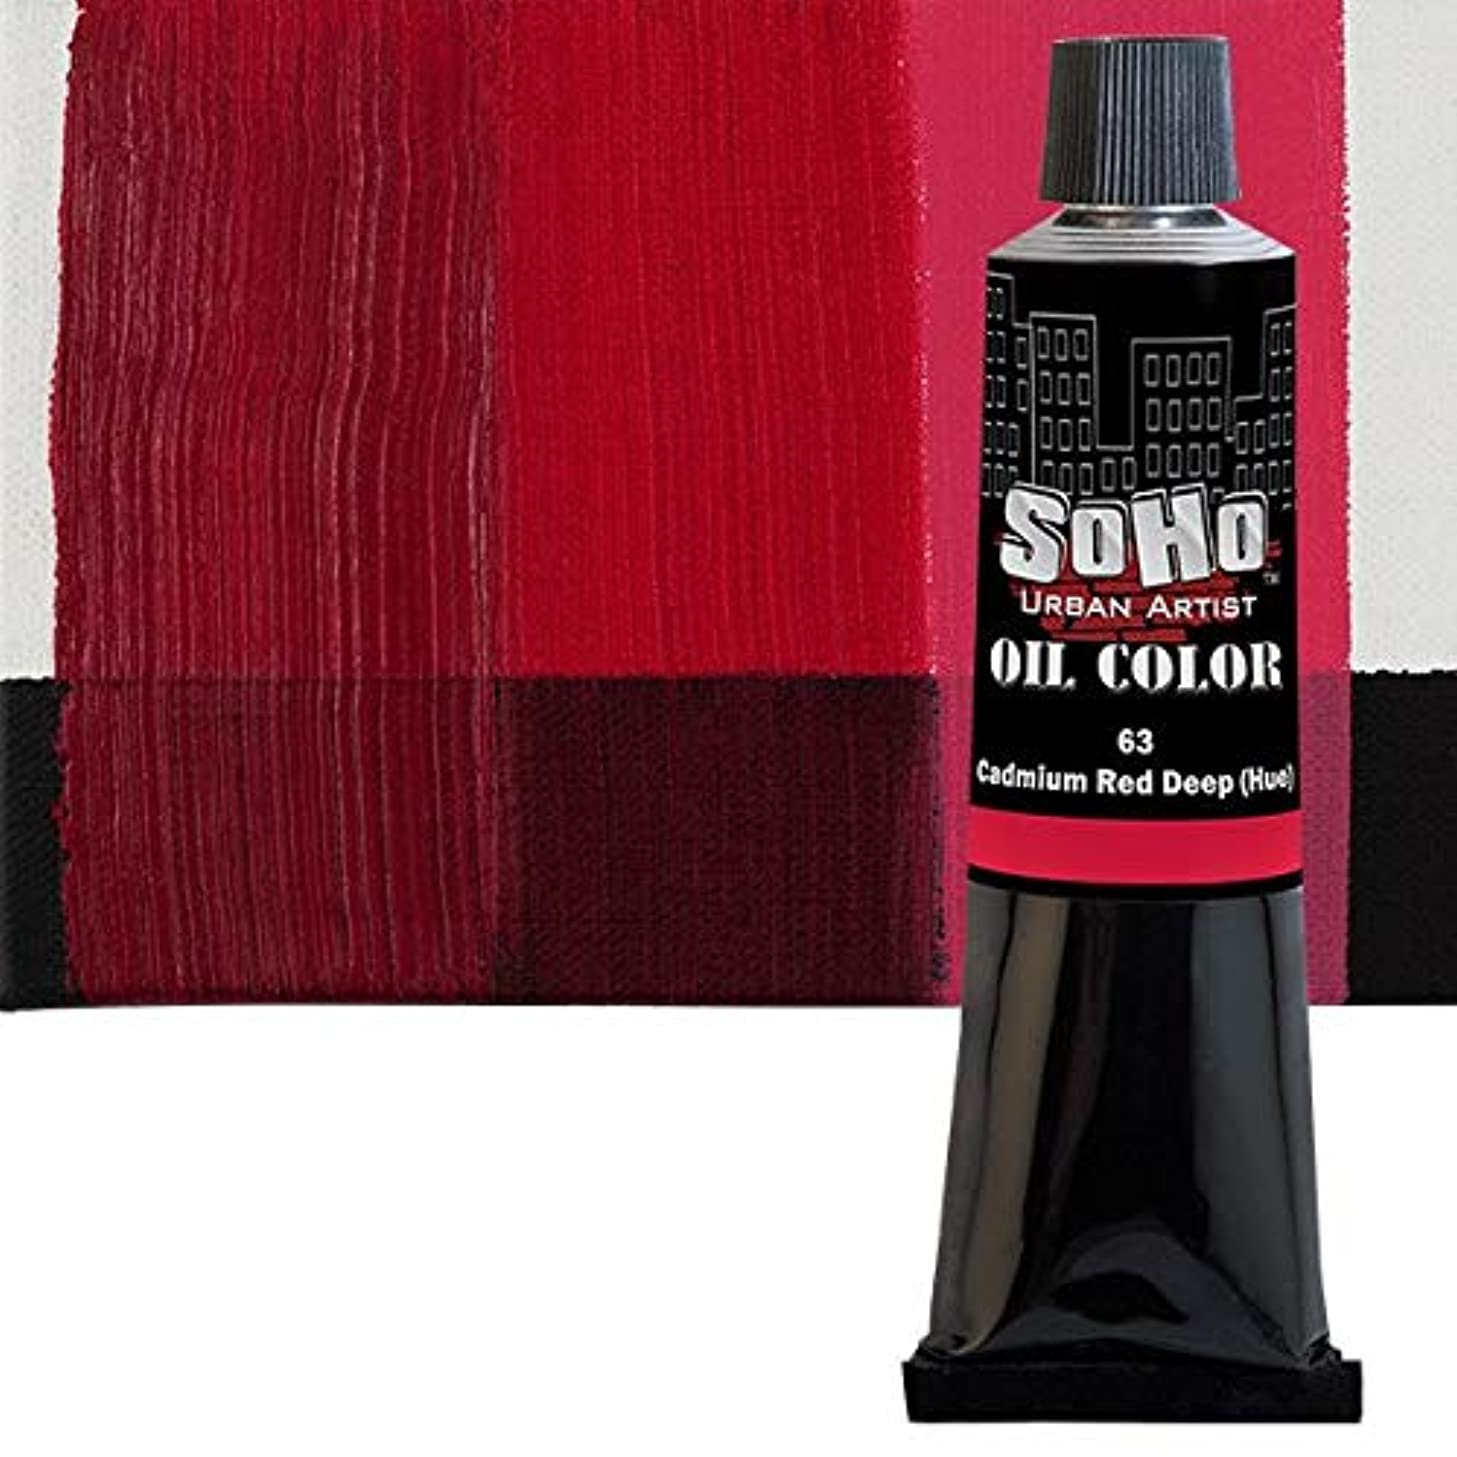 SoHo Urban Artist Oil Color - 170 ml Tube - Cadmium Red Deep Hue